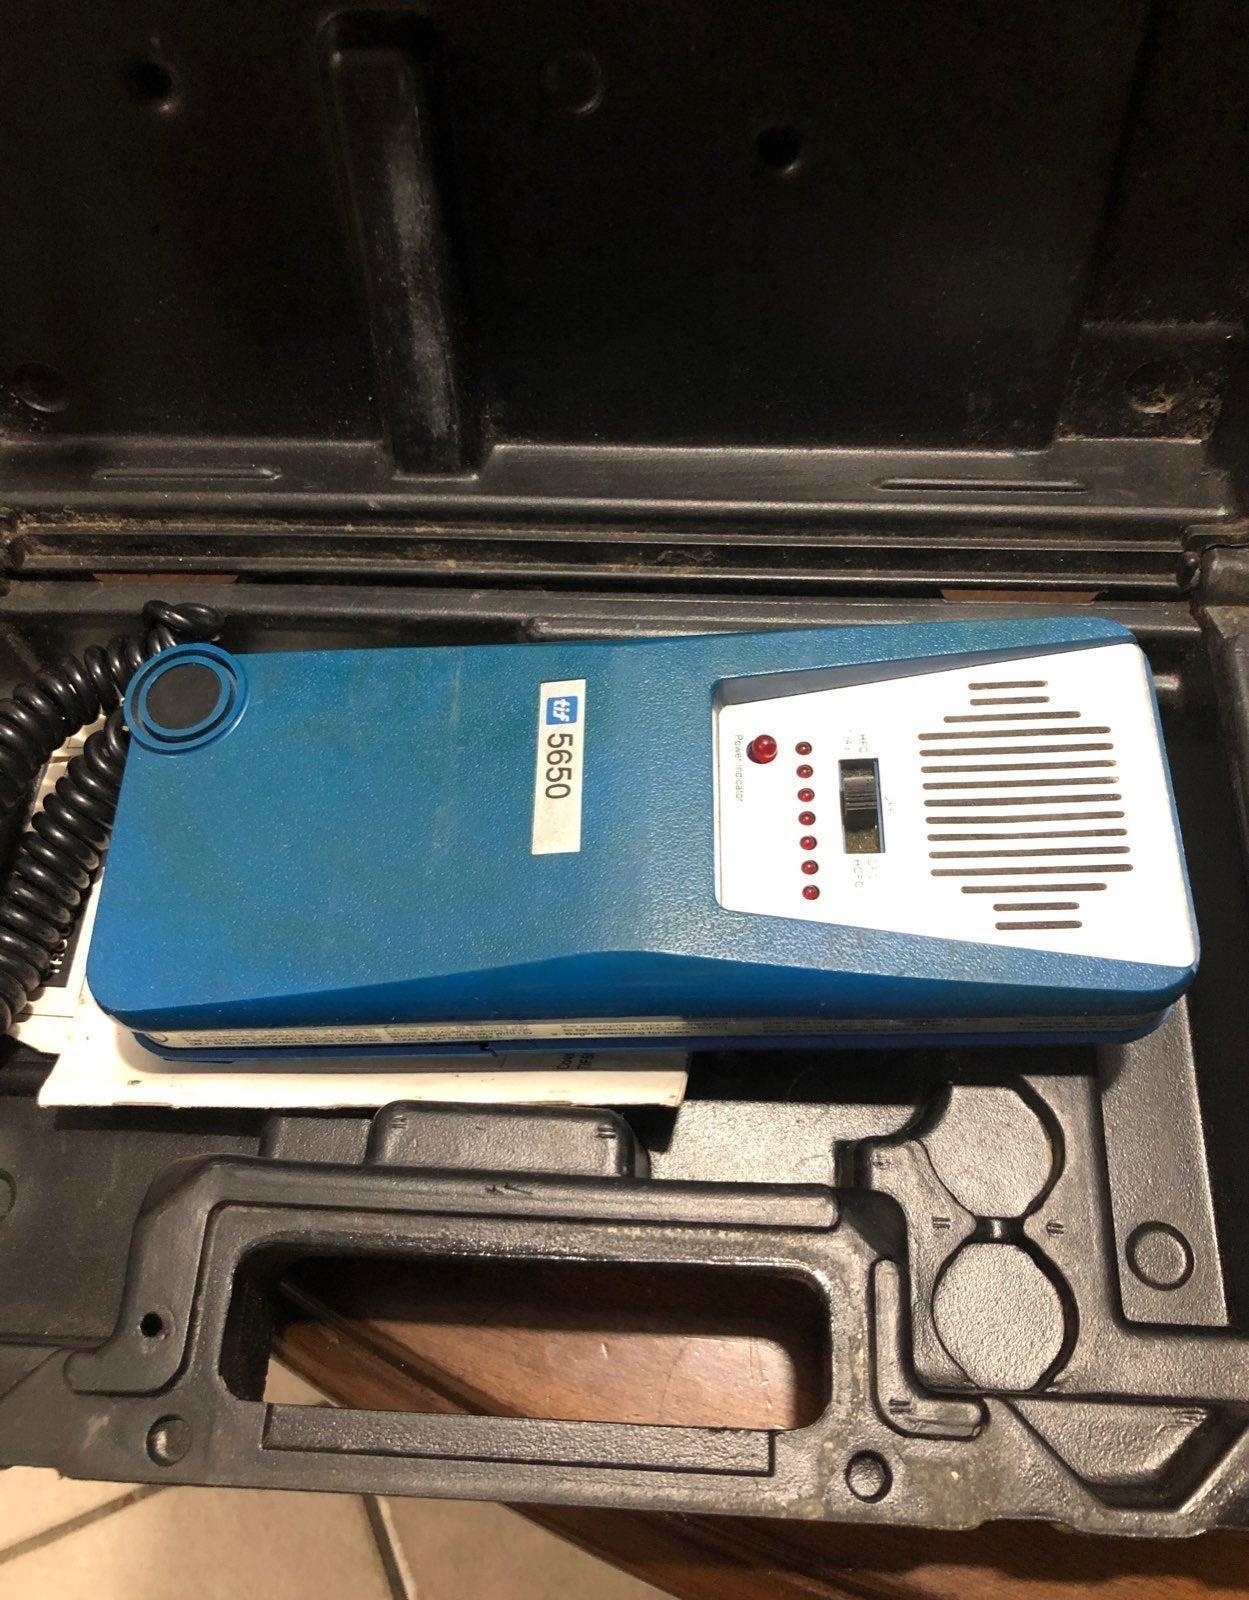 Tif 5650 halogen leak detector